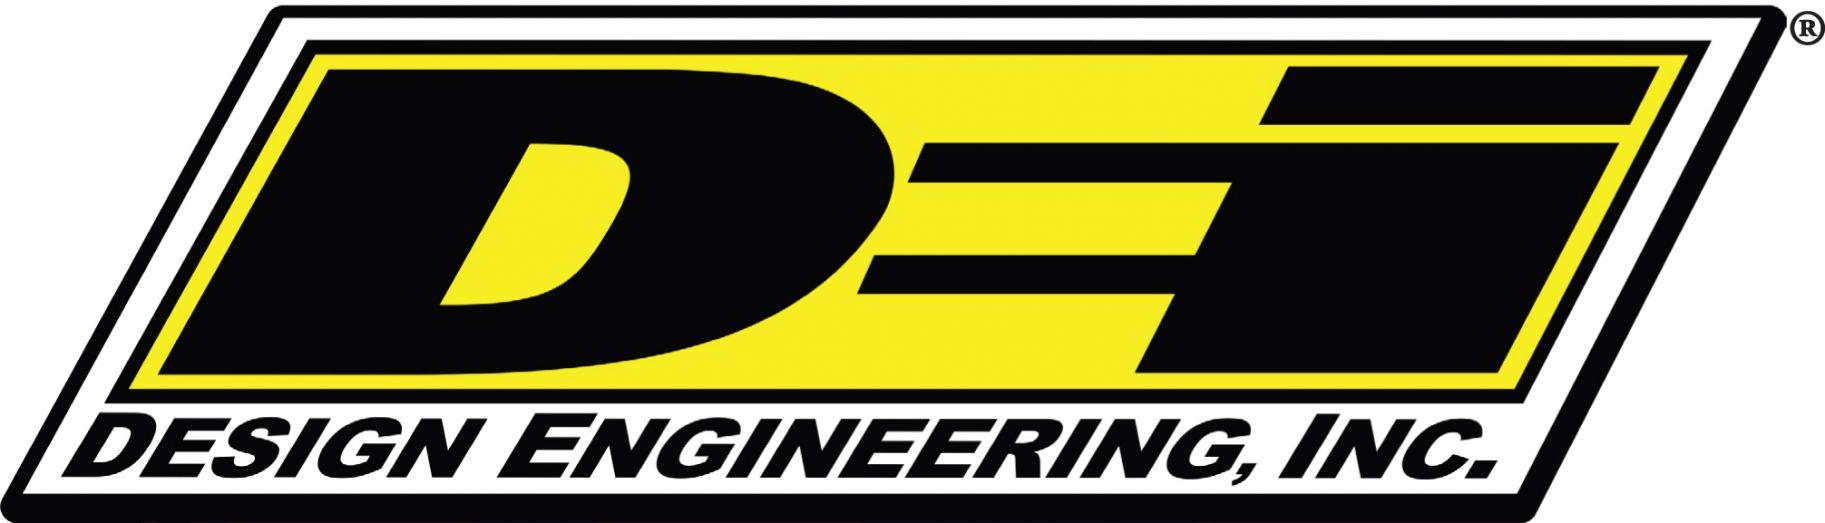 Design Engineering, Inc